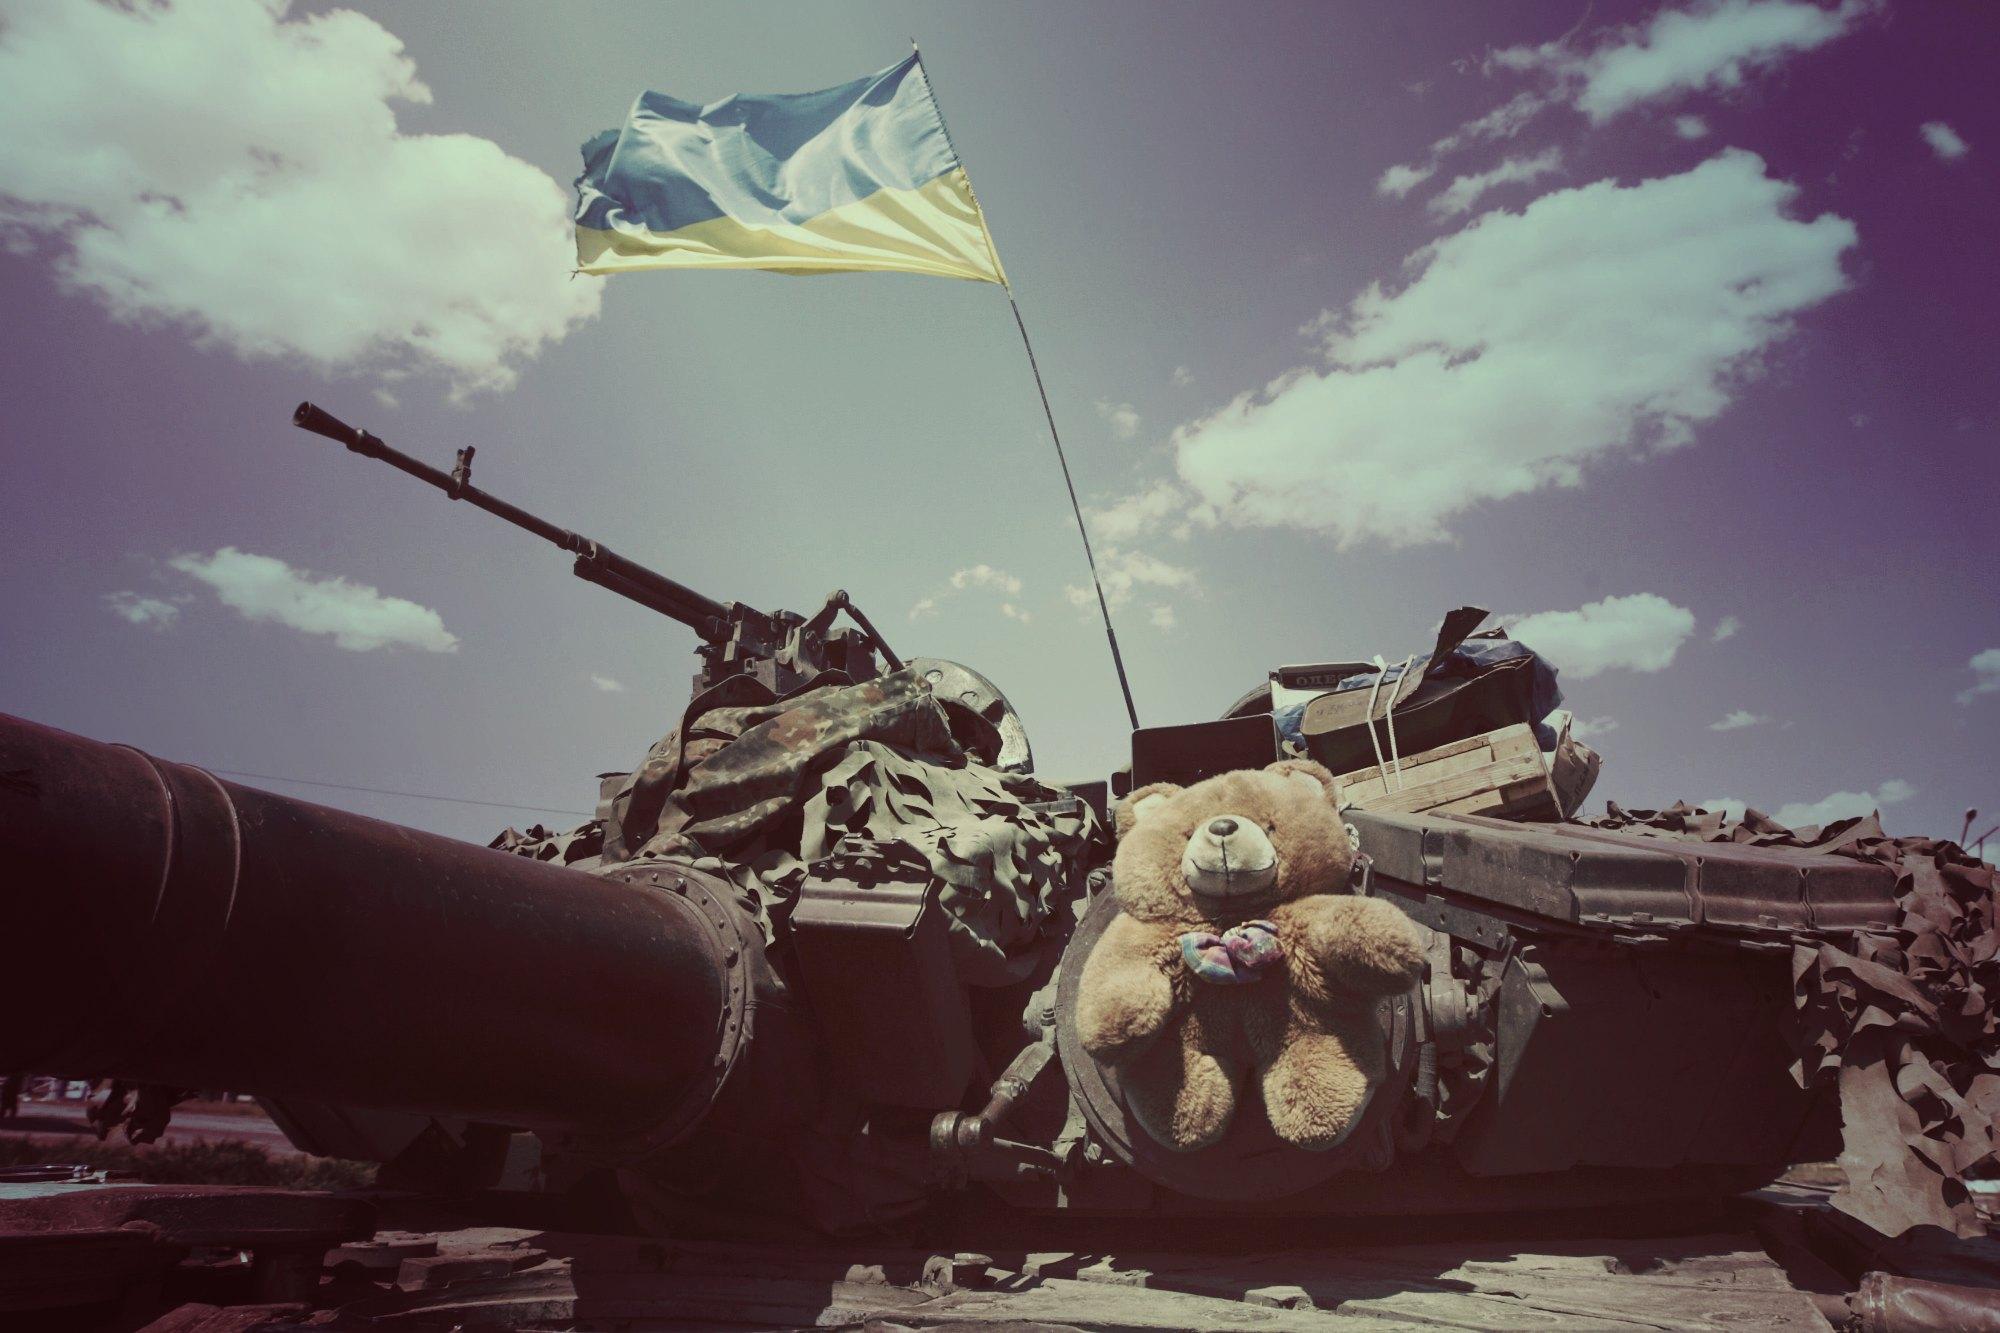 Украина может нанести решающий удар по боевикам «ДНР» и «ЛНР» – Генштаб